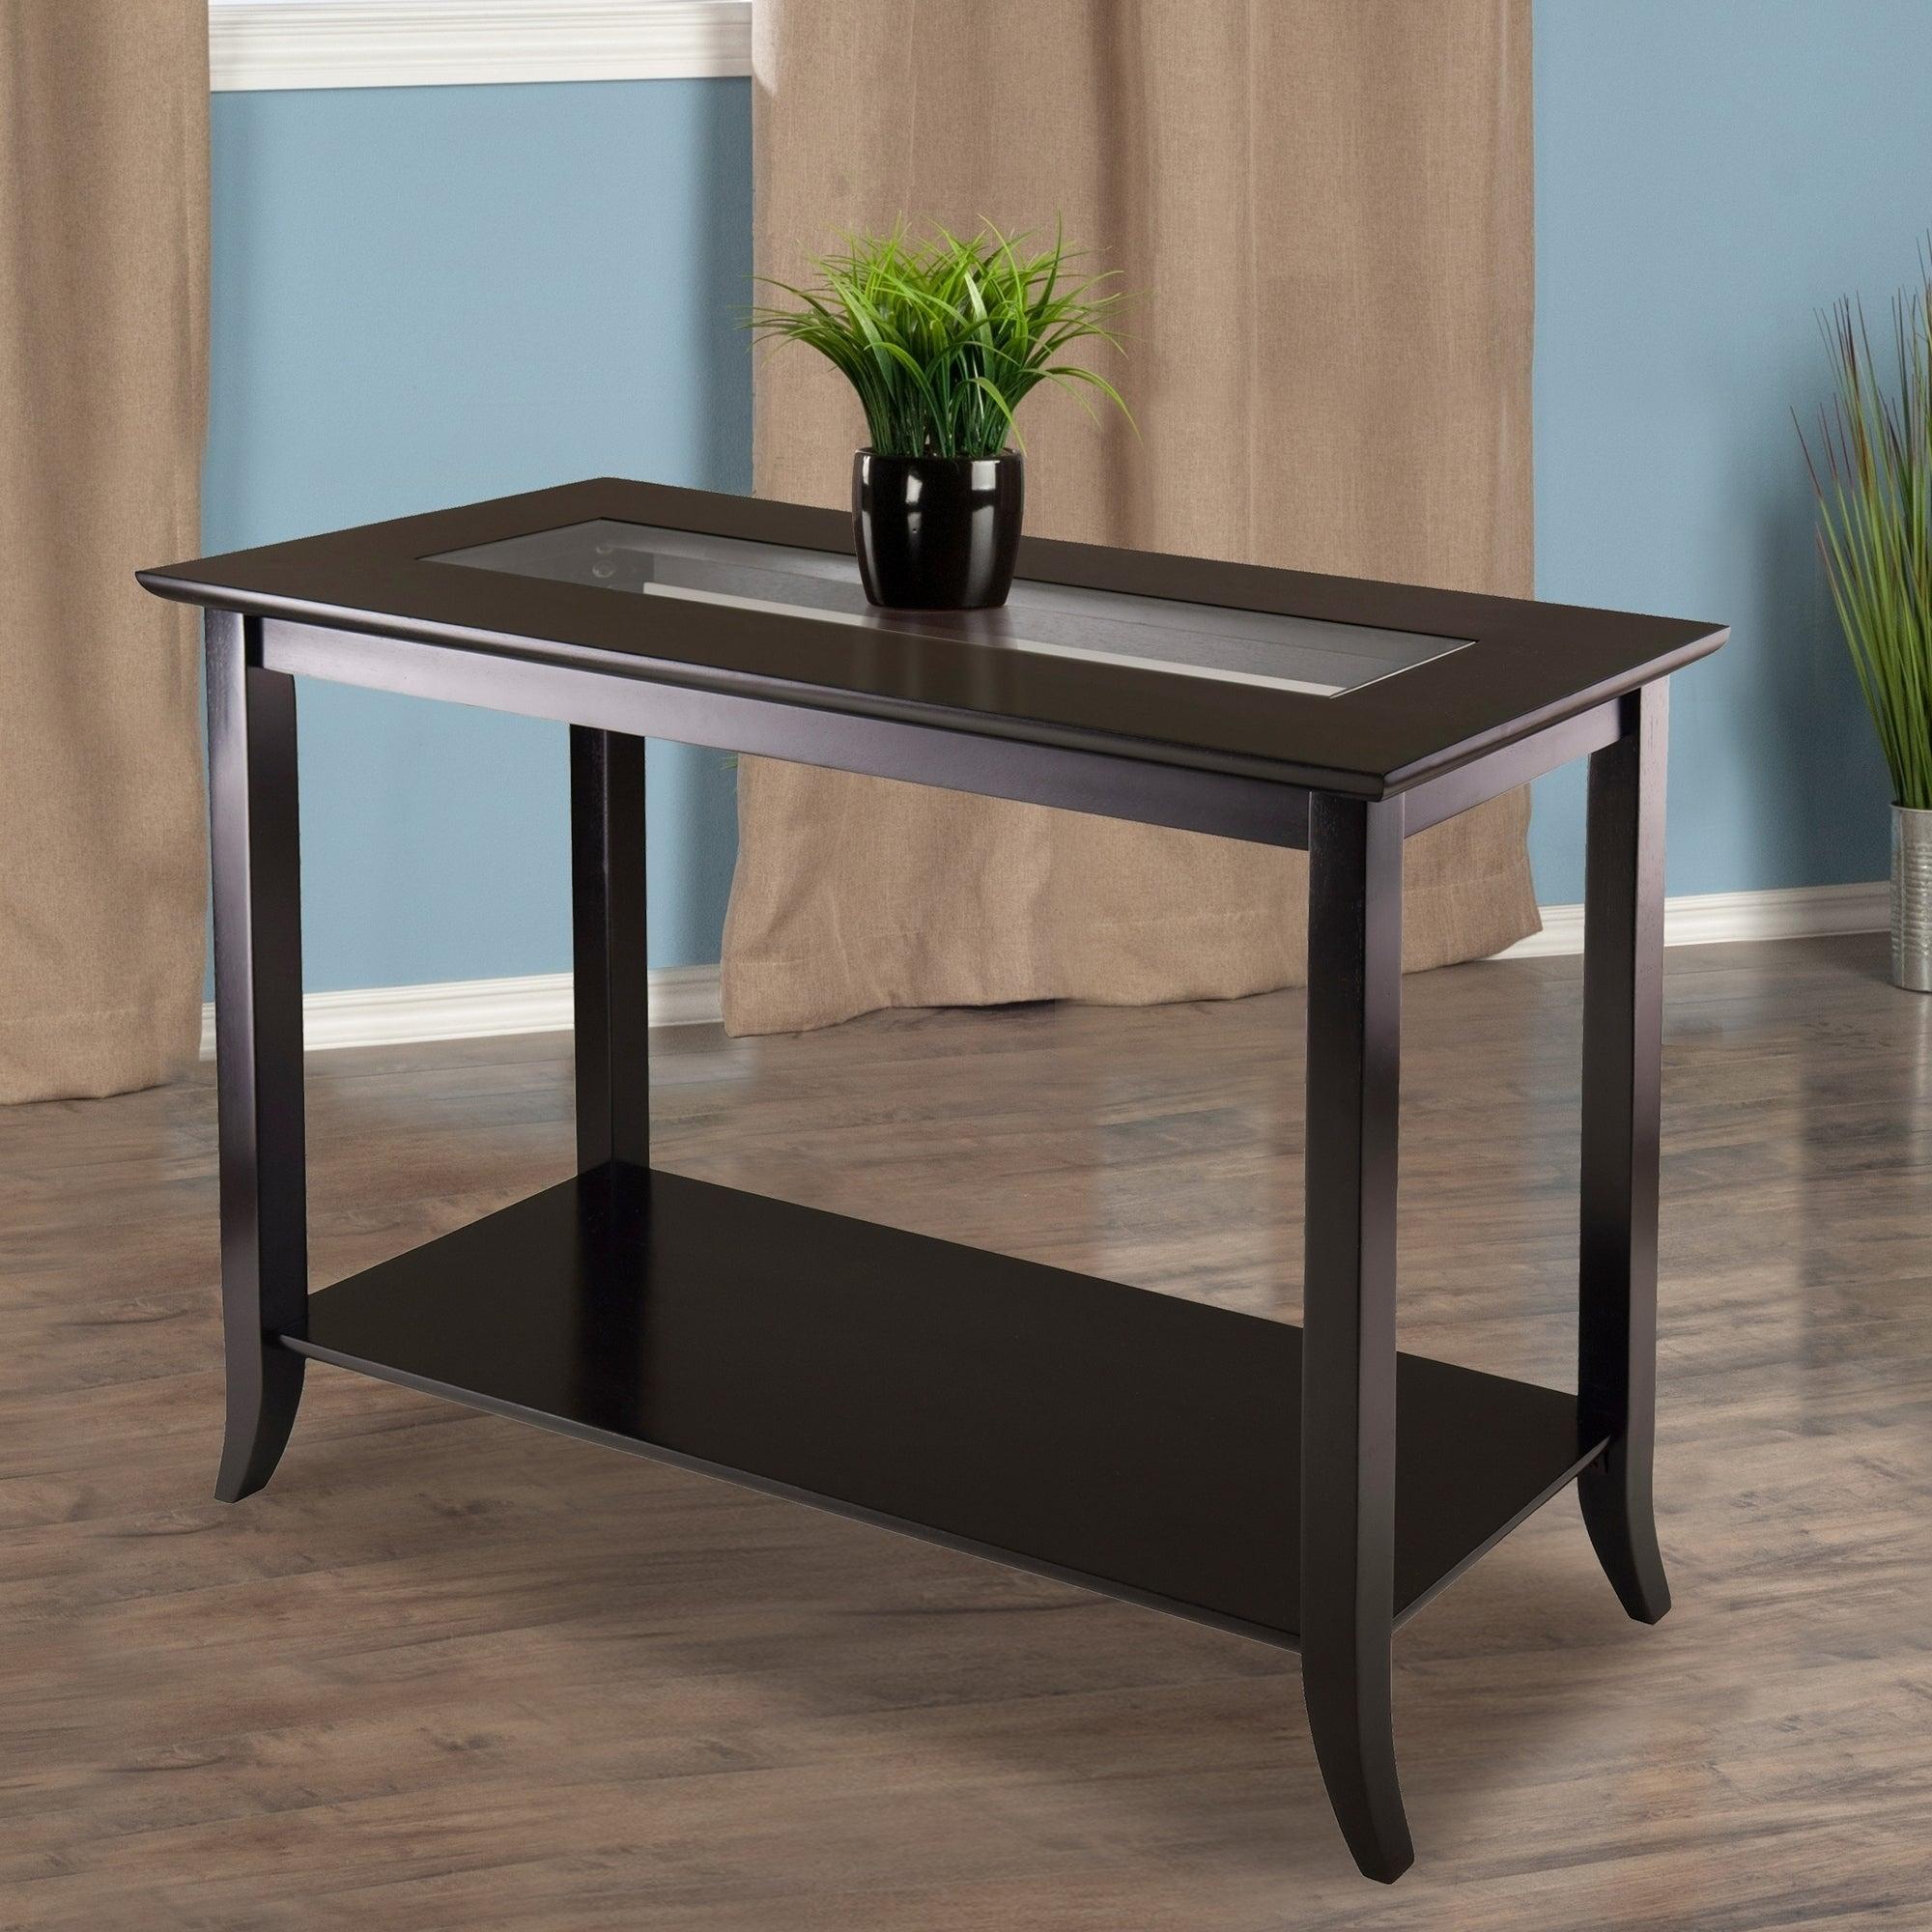 Copper Grove Shasta Trinity Espresso Finish Wood Gl Insert Rectangular Console Table